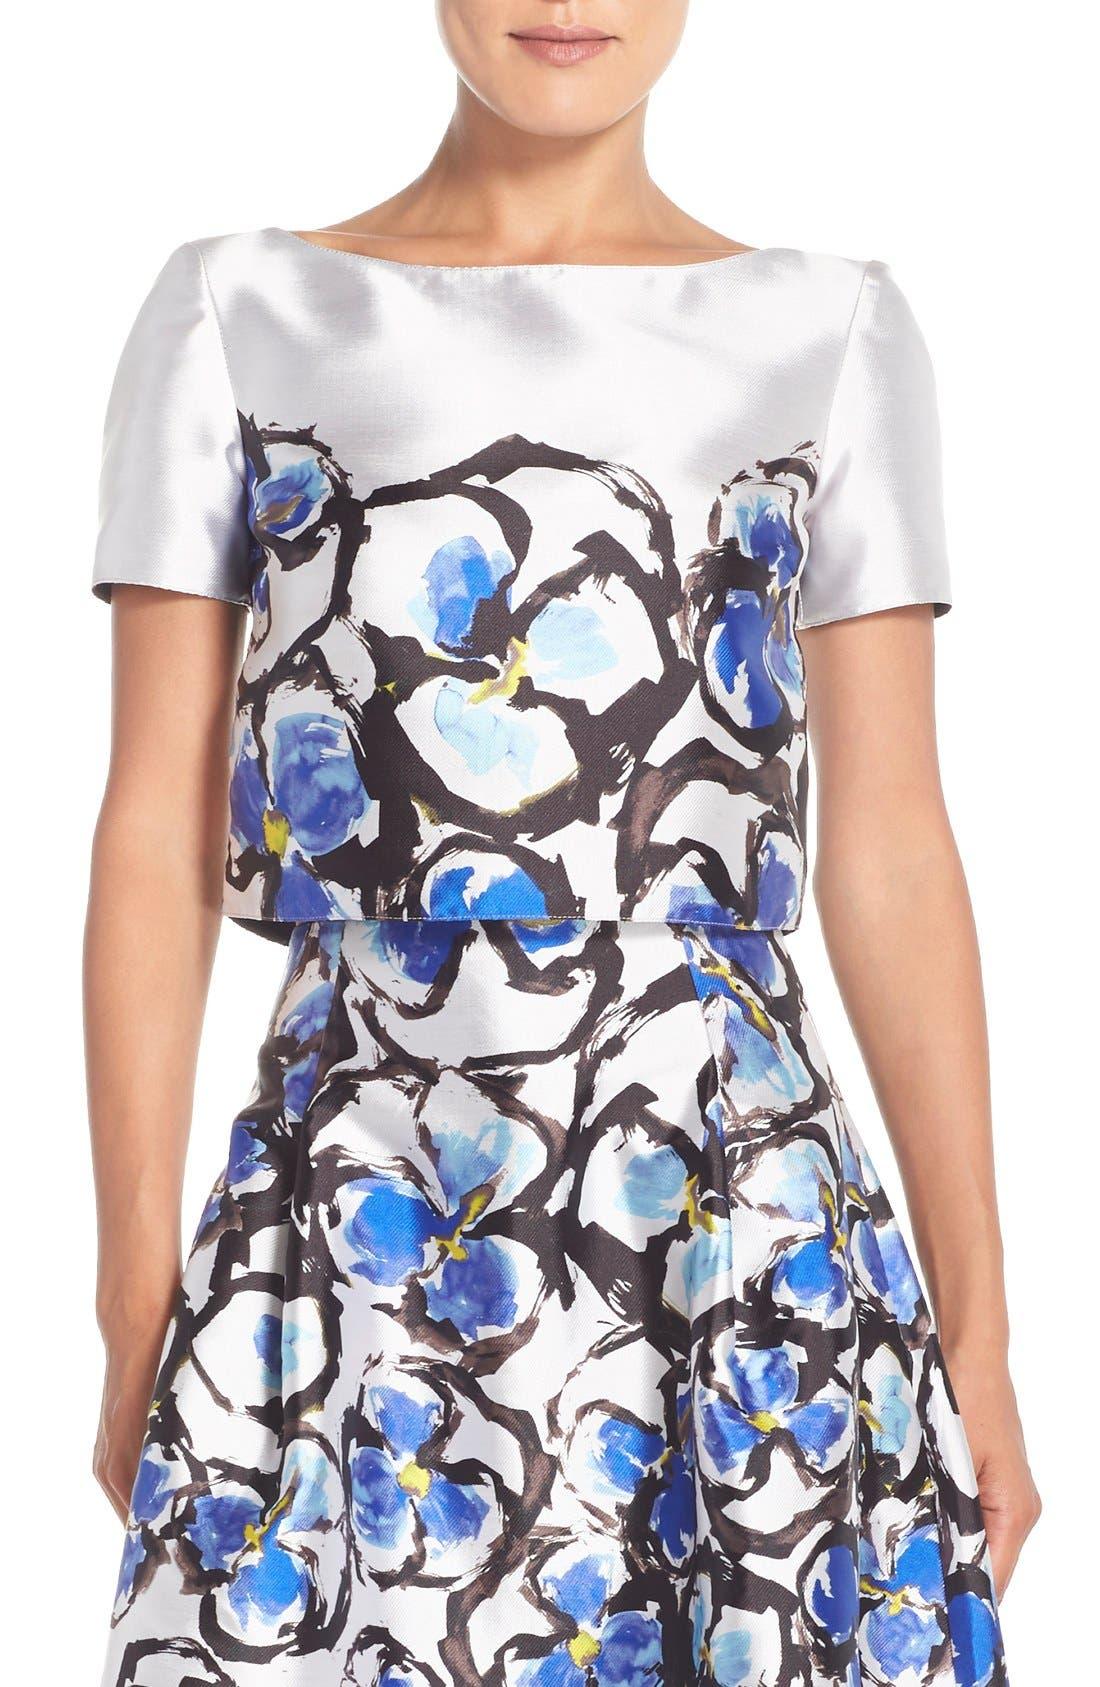 Alternate Image 1 Selected - Sachin & Babi Noir 'Rosie' Floral Crop Top